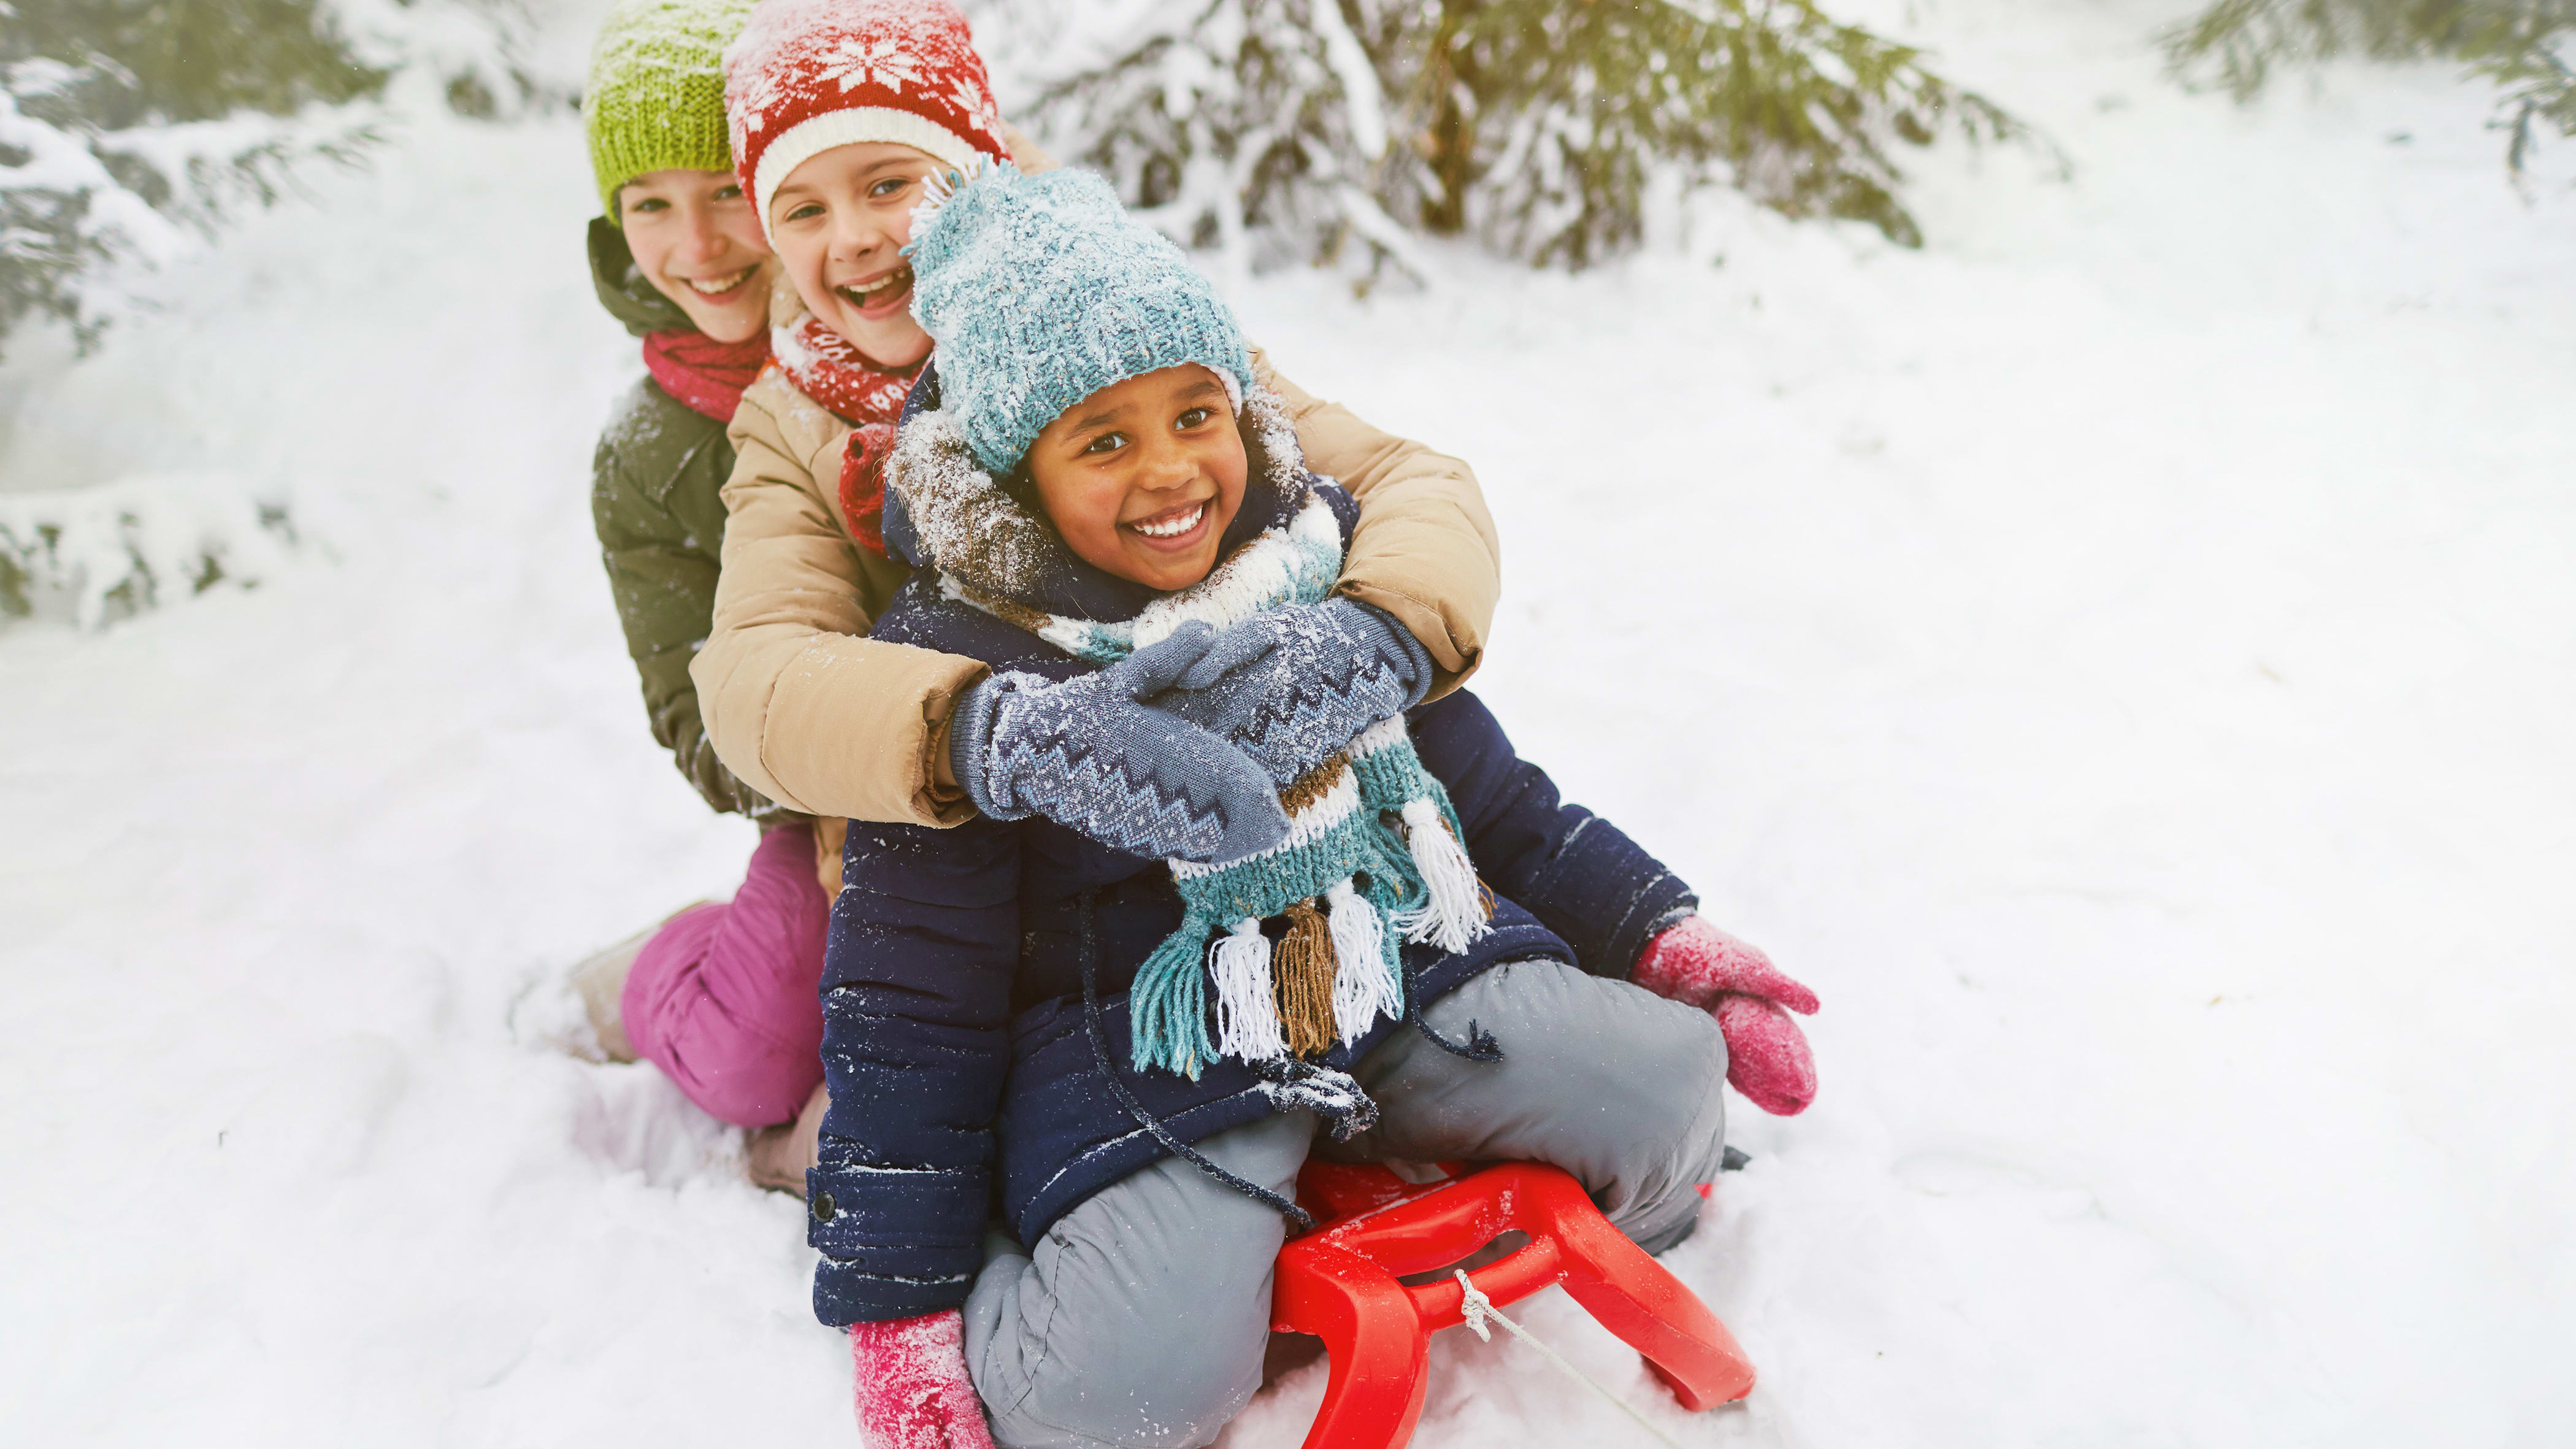 La programmation de Vacances d'hiver 2020 de LaSalle est sortie!